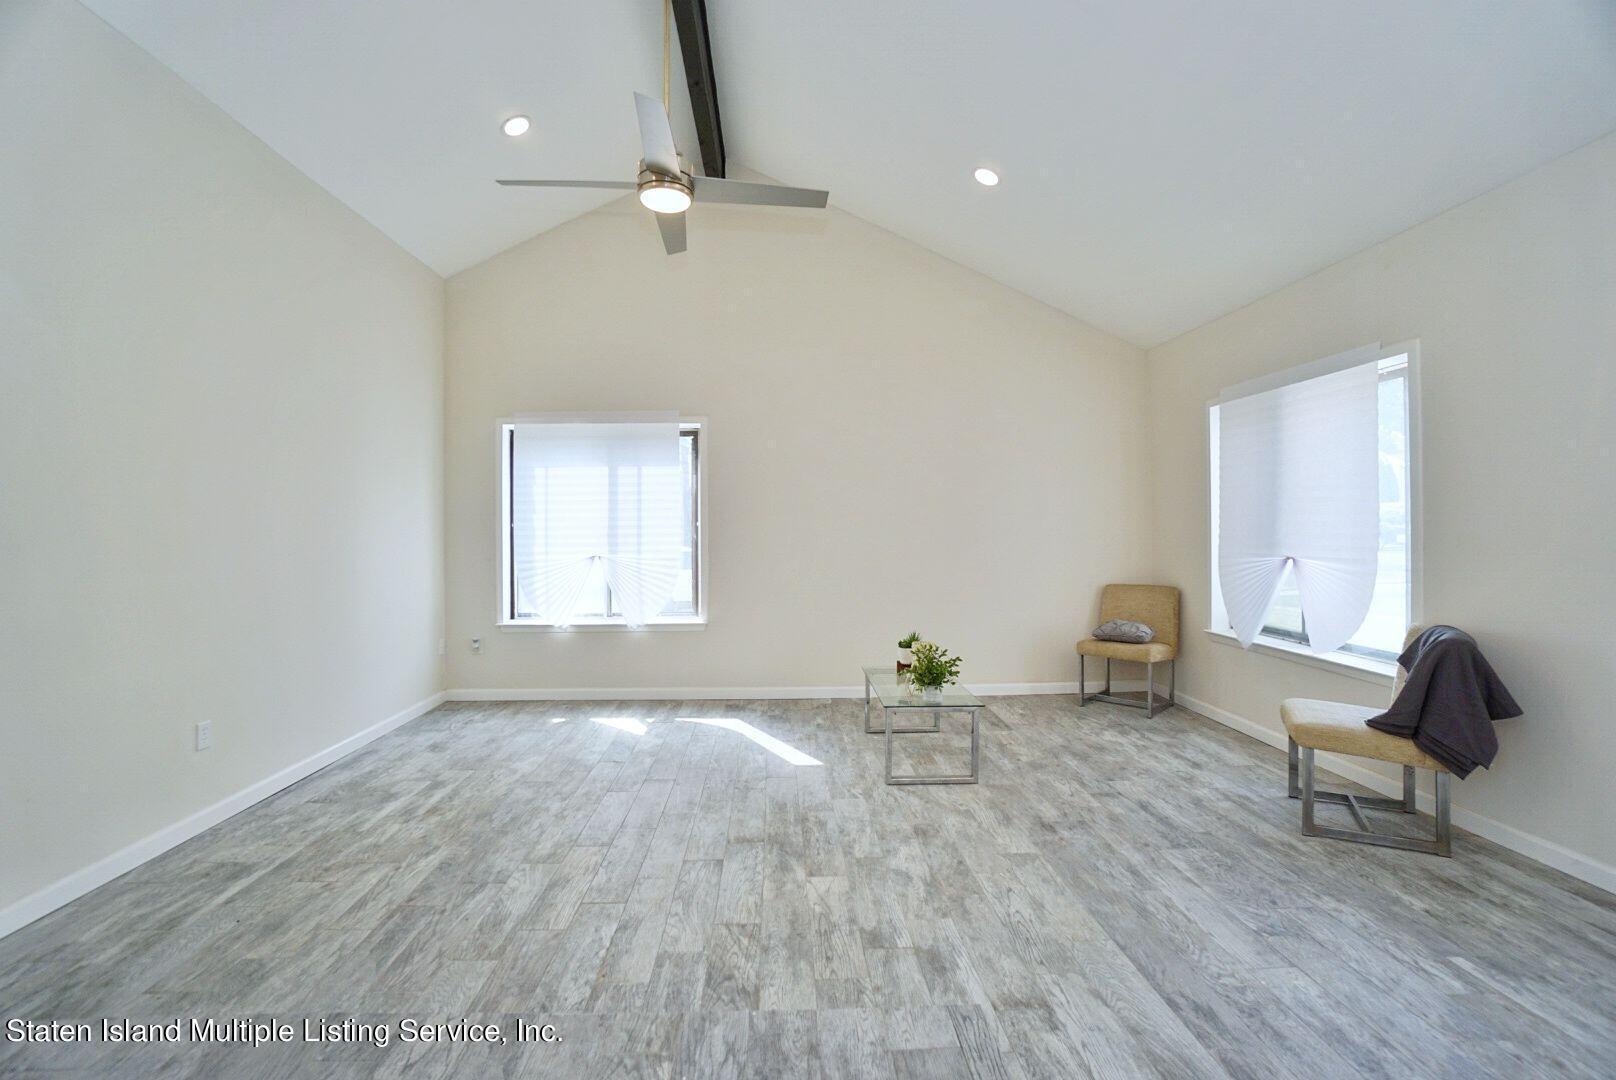 Single Family - Detached 83 Boylan Street  Staten Island, NY 10312, MLS-1149266-4